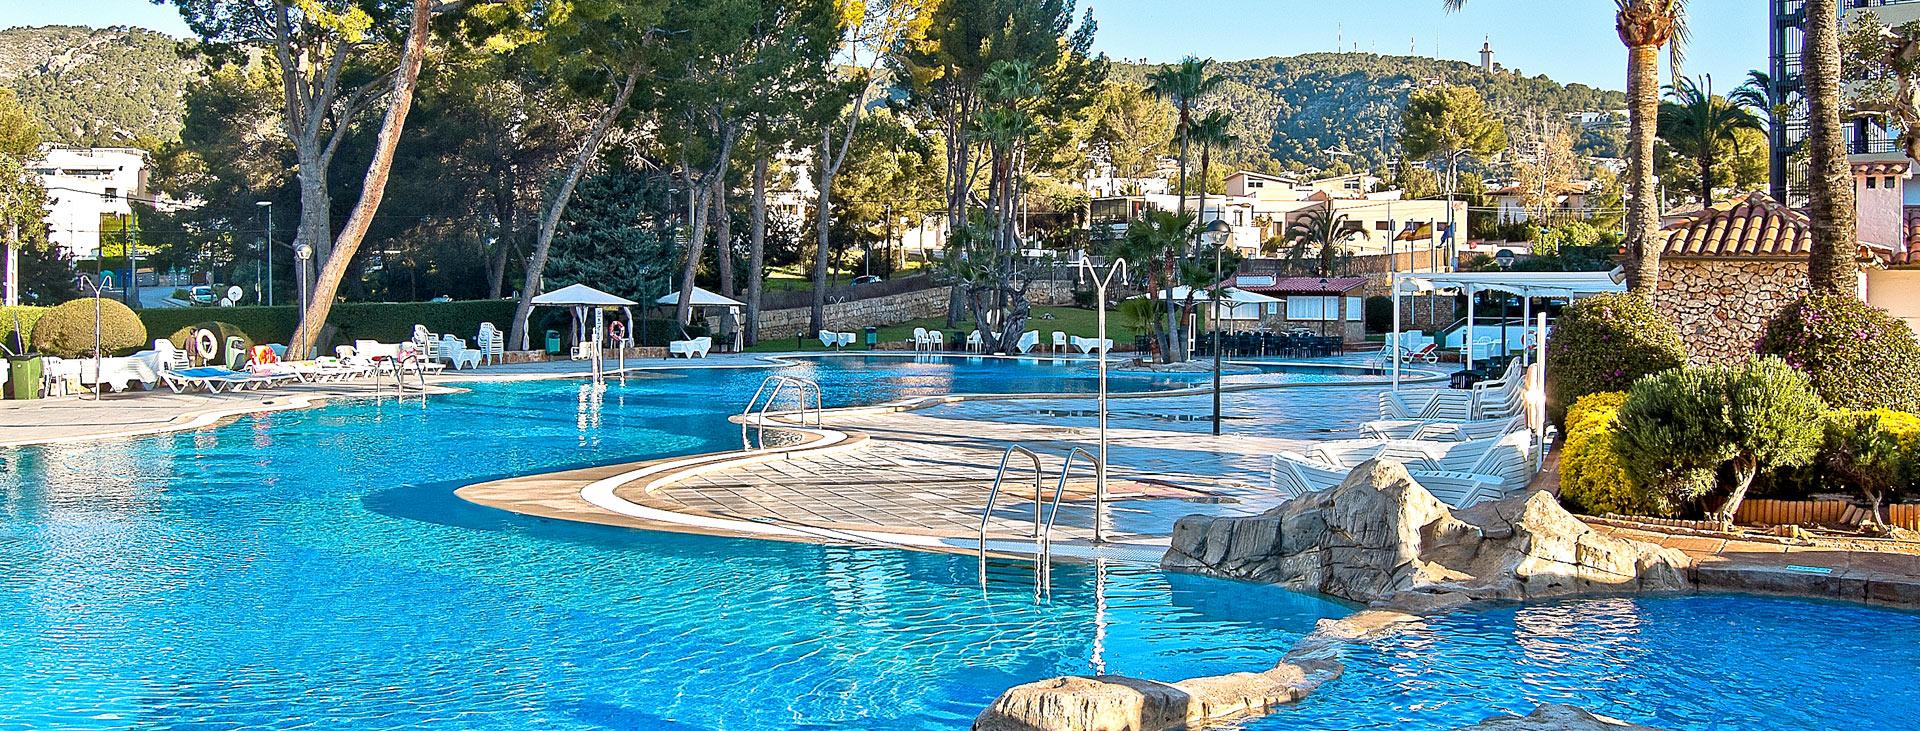 BQ Belvedere, Cala Mayor, Mallorca, Spanien